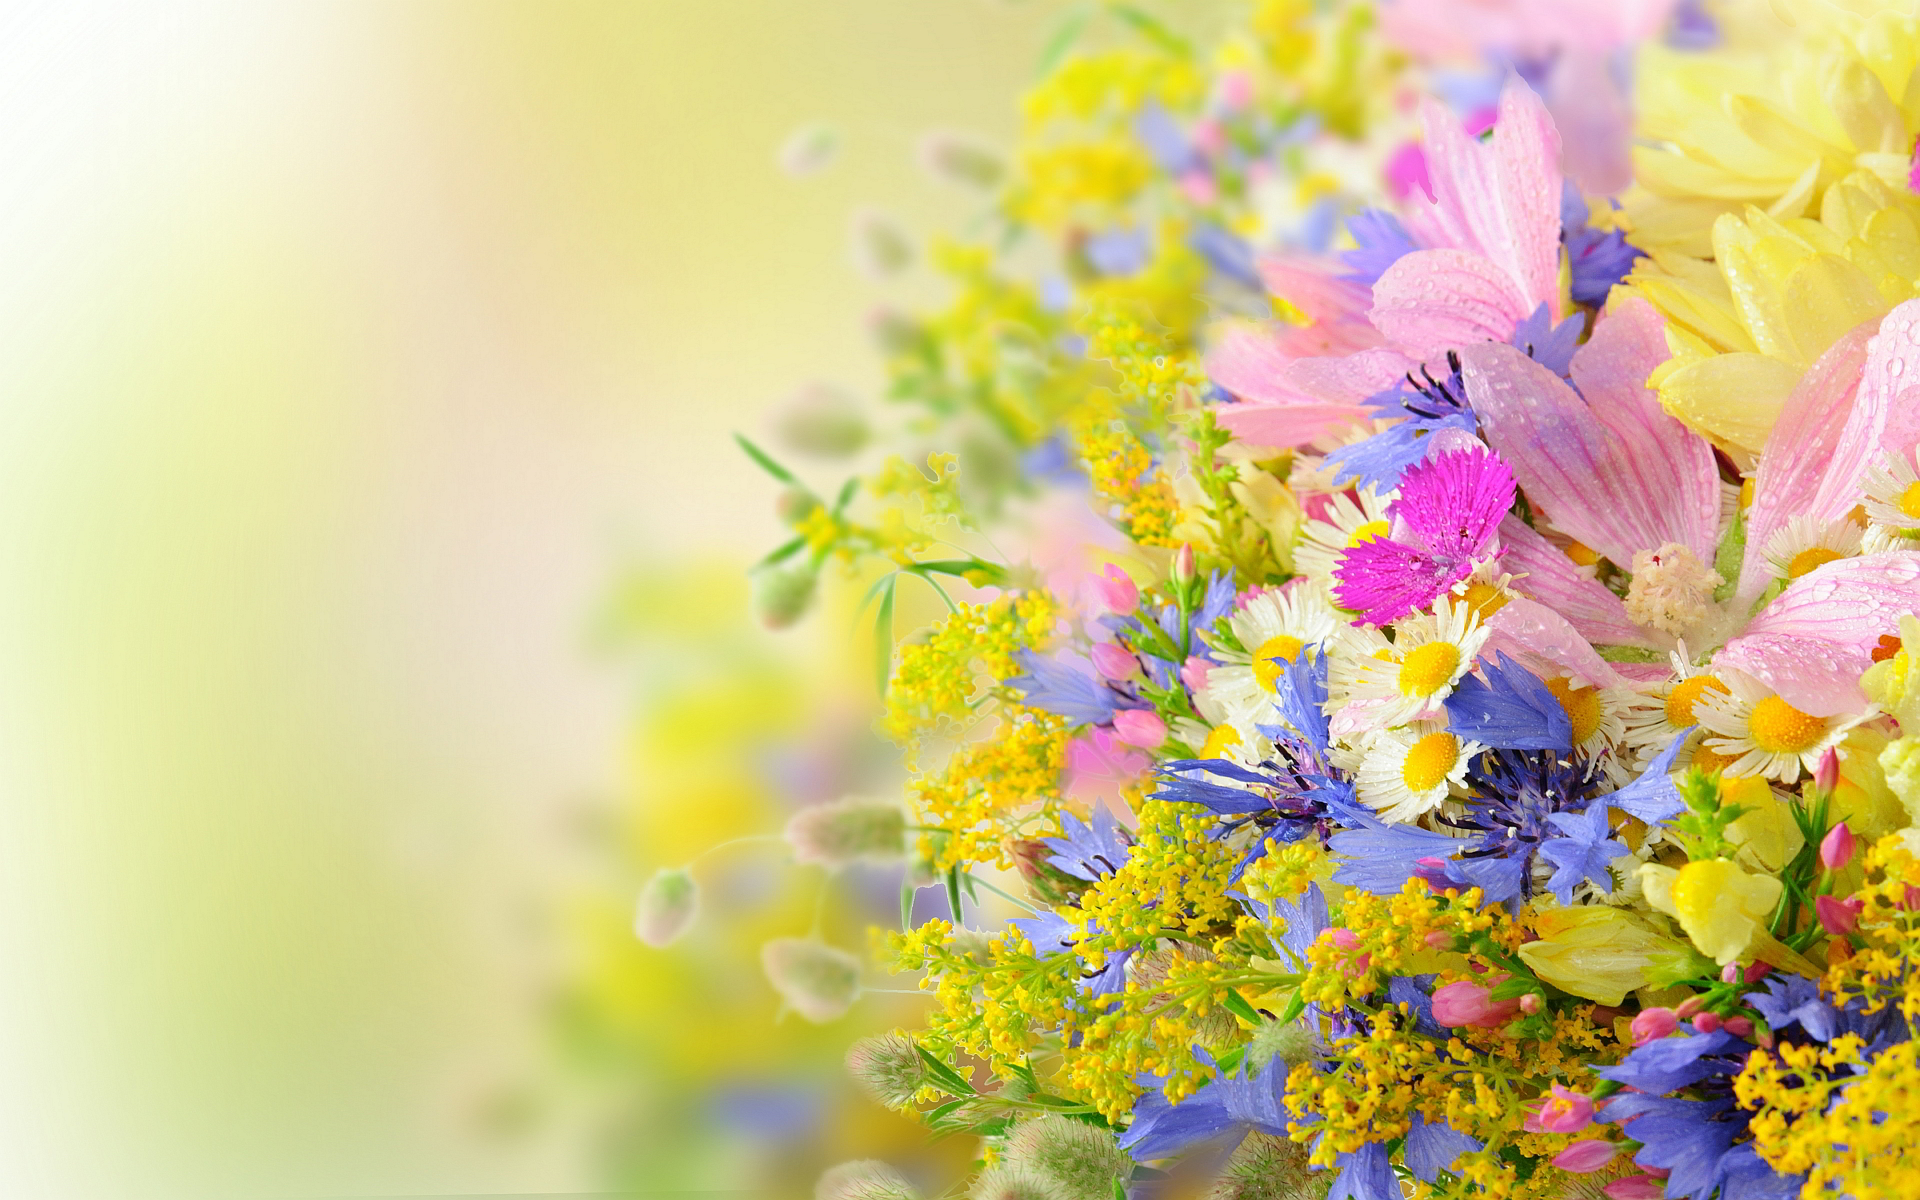 Many summer flowers